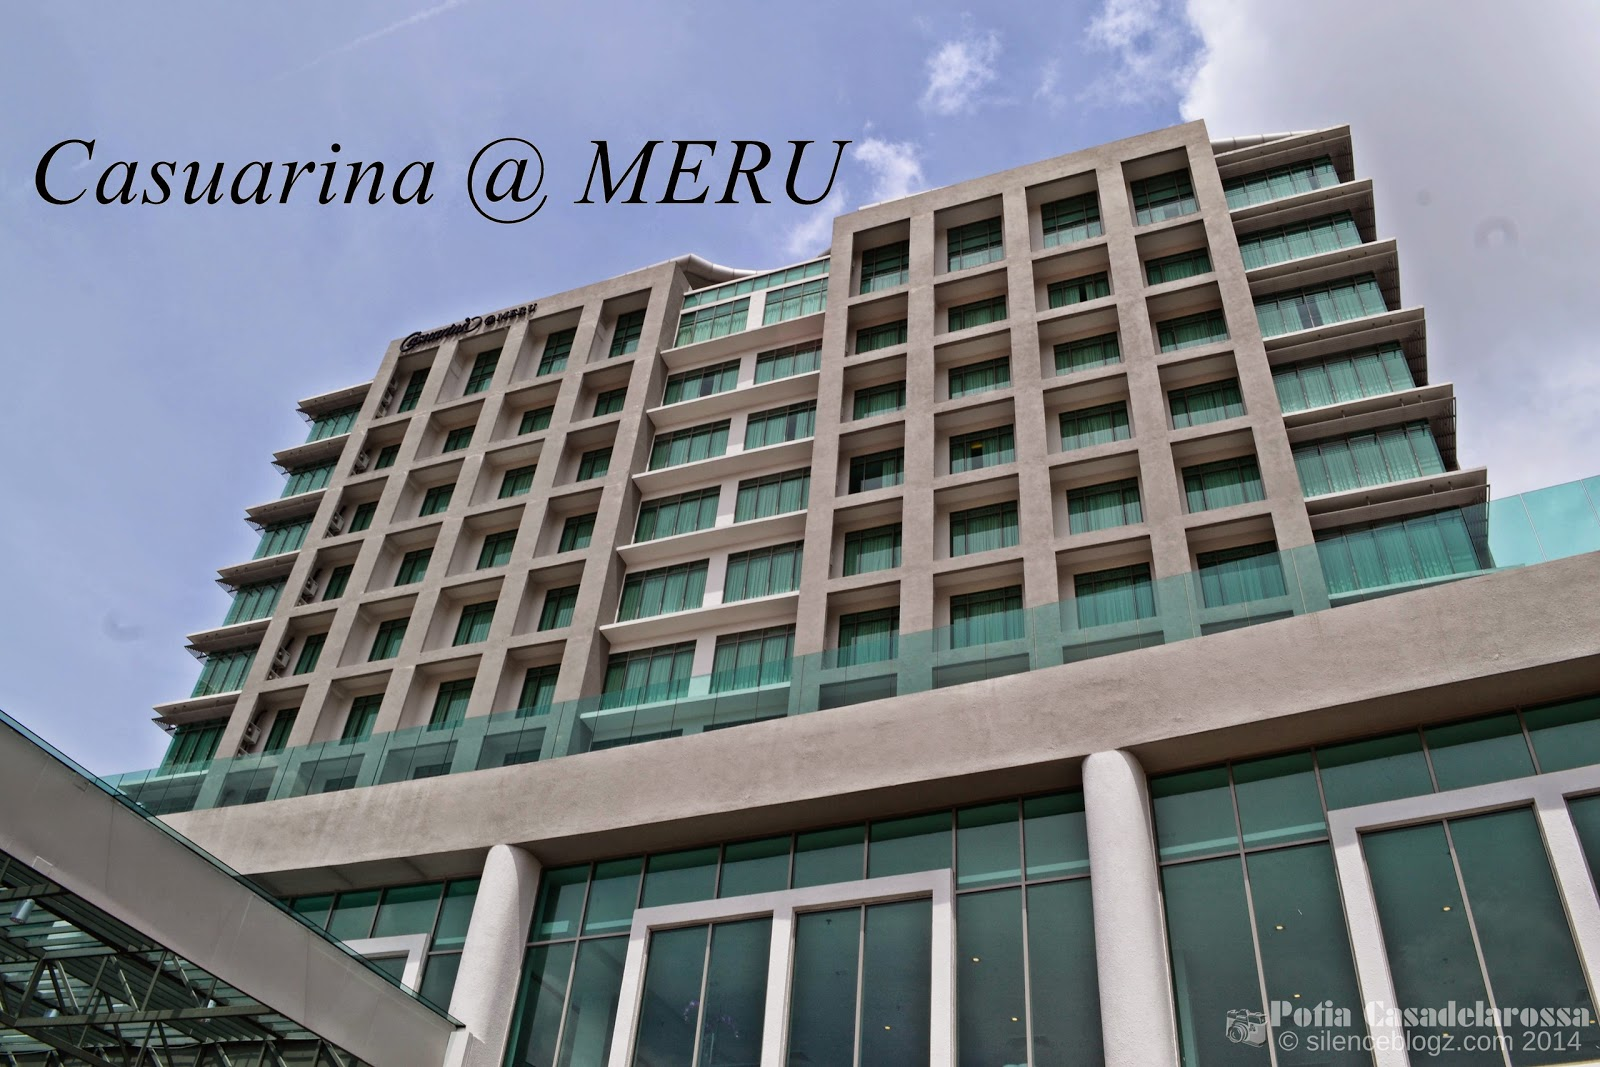 Hotel Casuarina Meru Penginapan Terbaik Ipoh